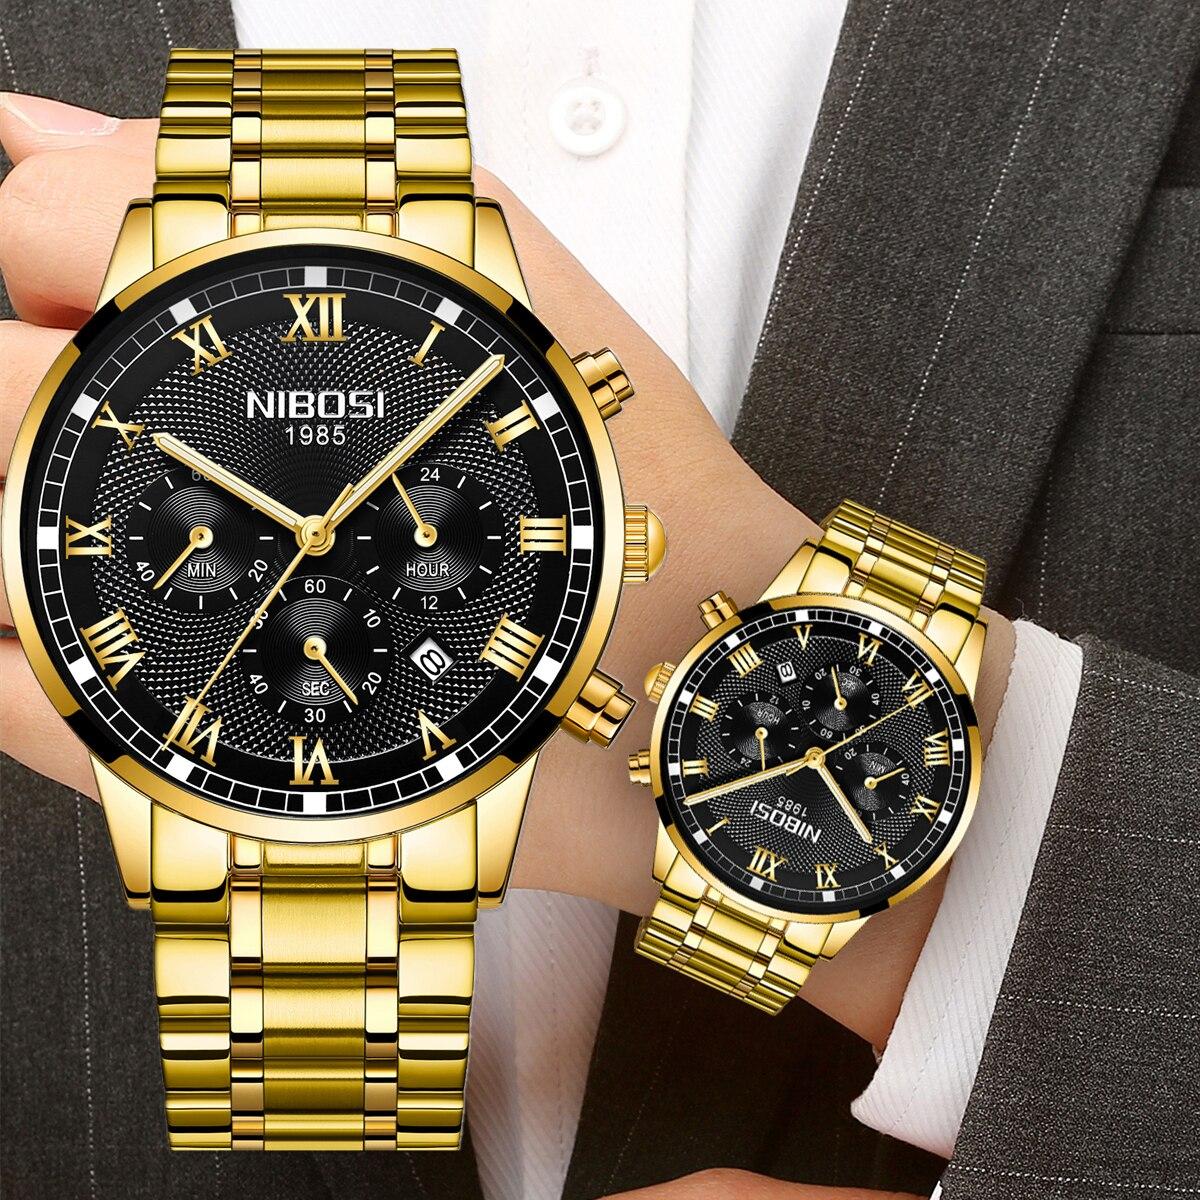 NIBOSI الرجال الساعات موضة فاخرة ساعة كوارتز رجالية العلامة التجارية الفاخرة الأعمال مقاوم للماء ساعة كرونوغراف الرجال Relogio Masculino